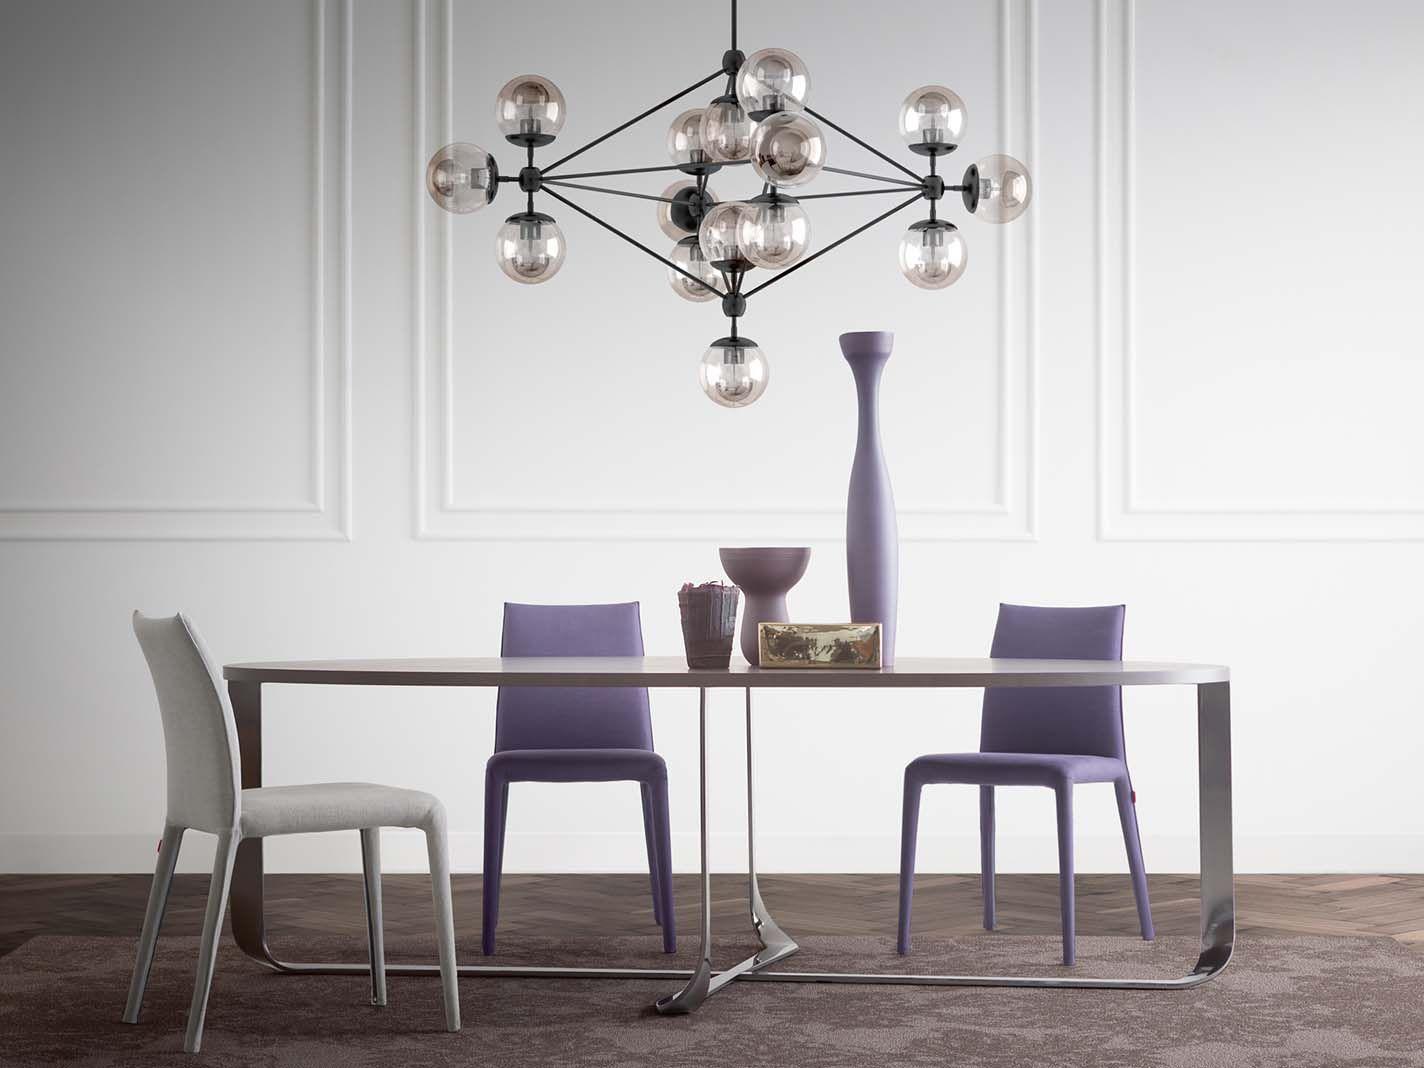 Tavolo Fenix ~ Confluence table designed by xavier lust emi slim chair